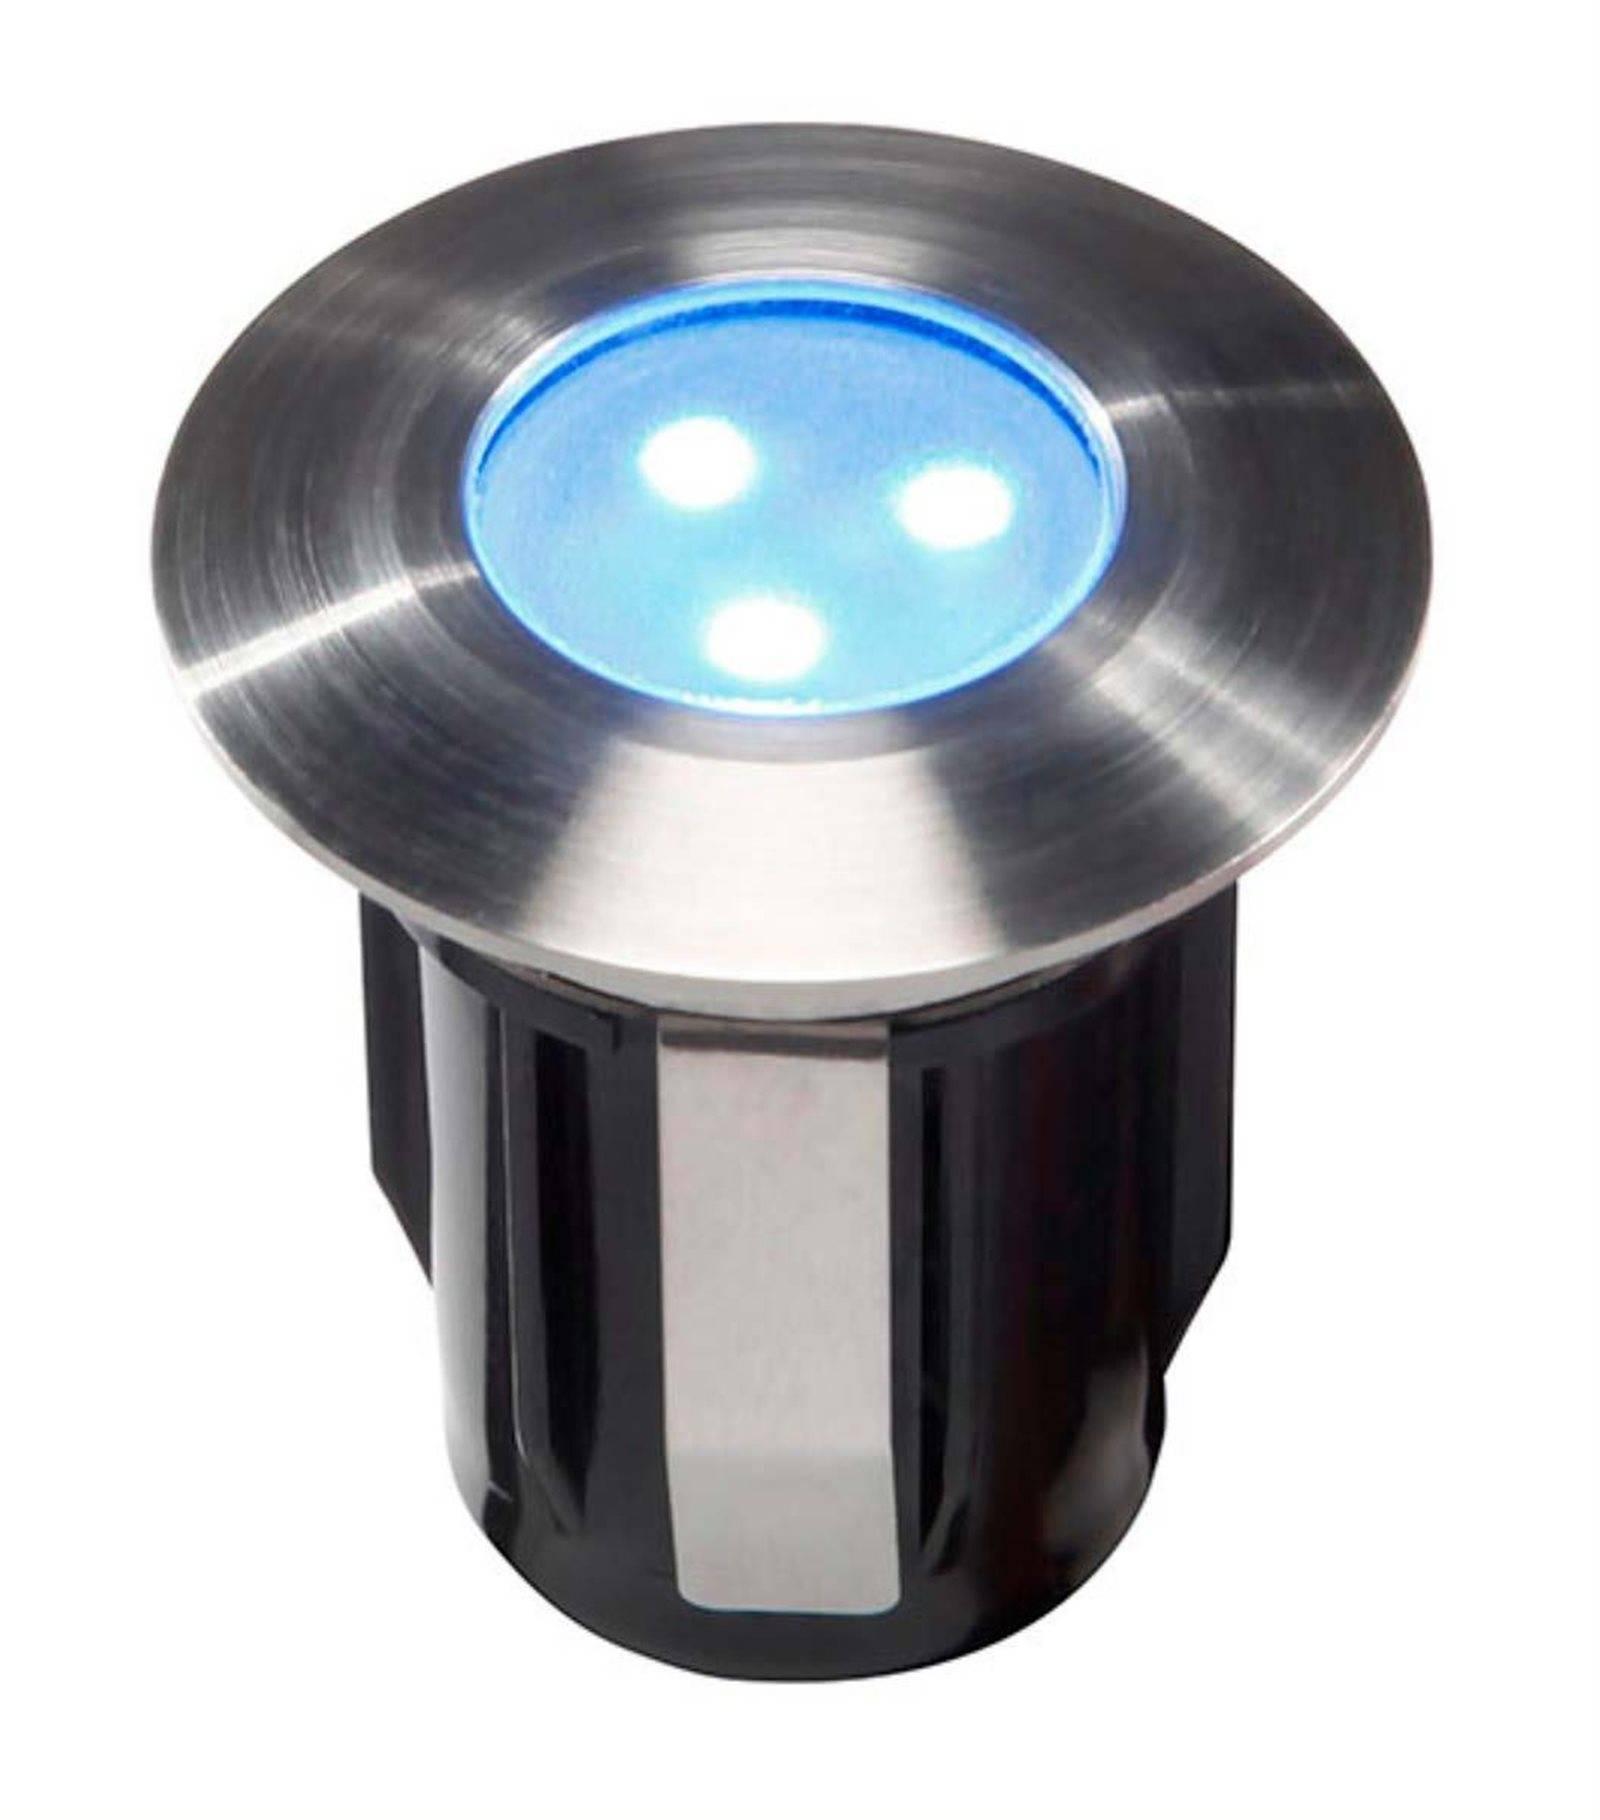 spot encastrable alpha bleu 0 5w platine led ip68 blanc tr s froid xterieur garden lights. Black Bedroom Furniture Sets. Home Design Ideas